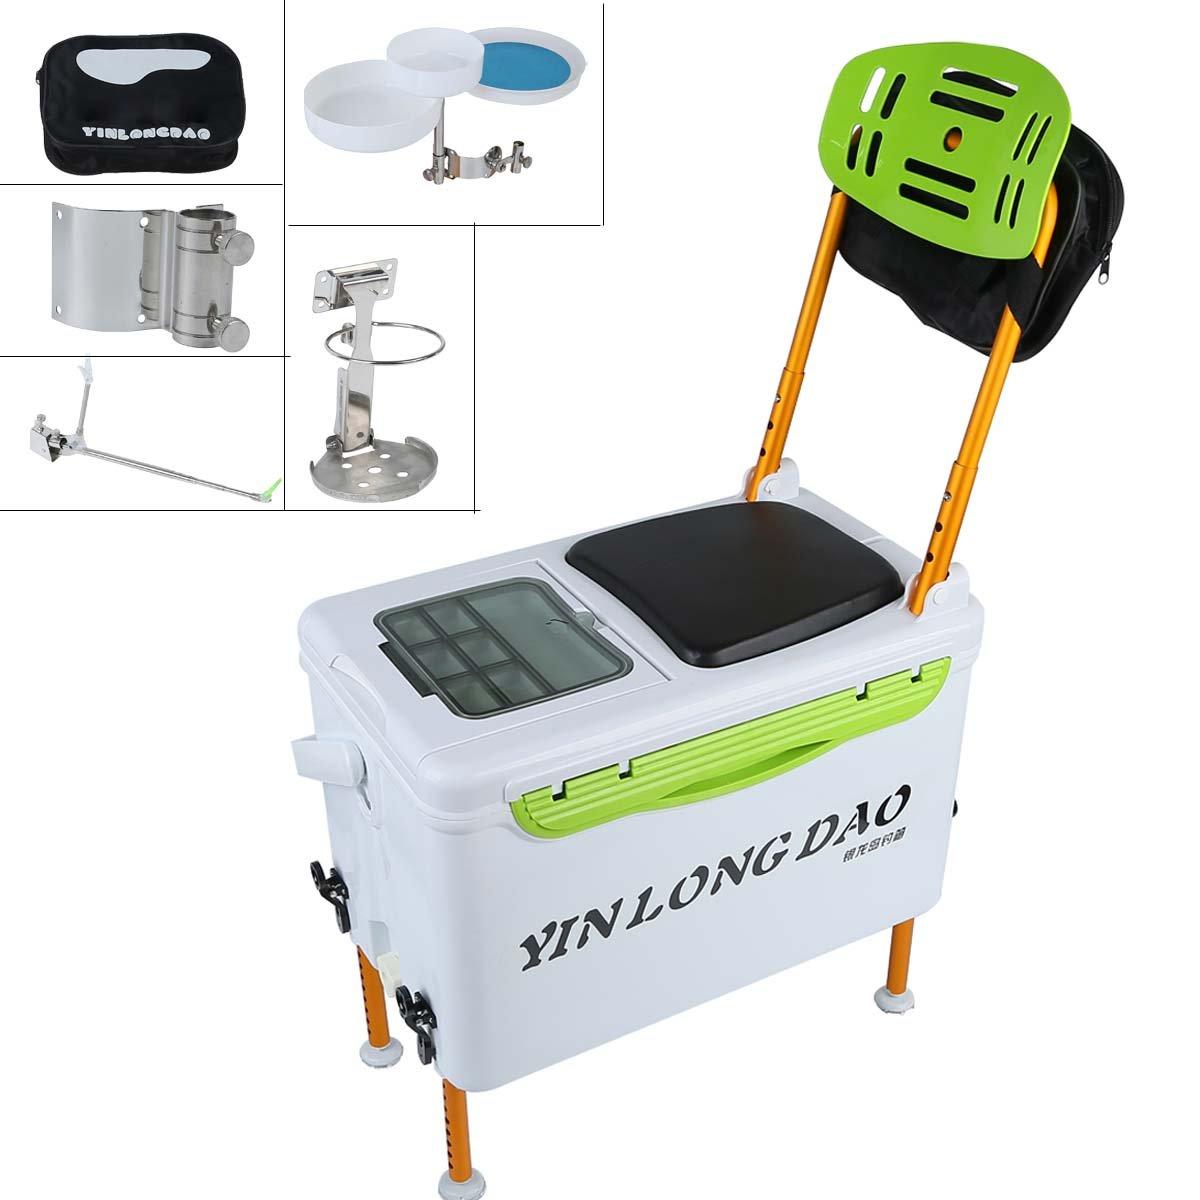 Tengchang Fishing Tackle Box Portable Fish Stuff Storage Case Adjustable Backrest Seat by Tengchang